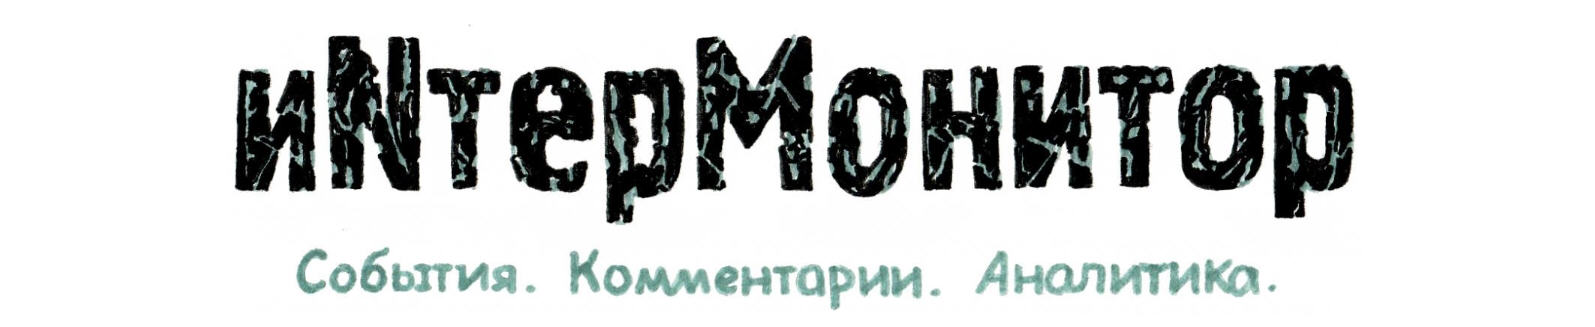 Интермонитор